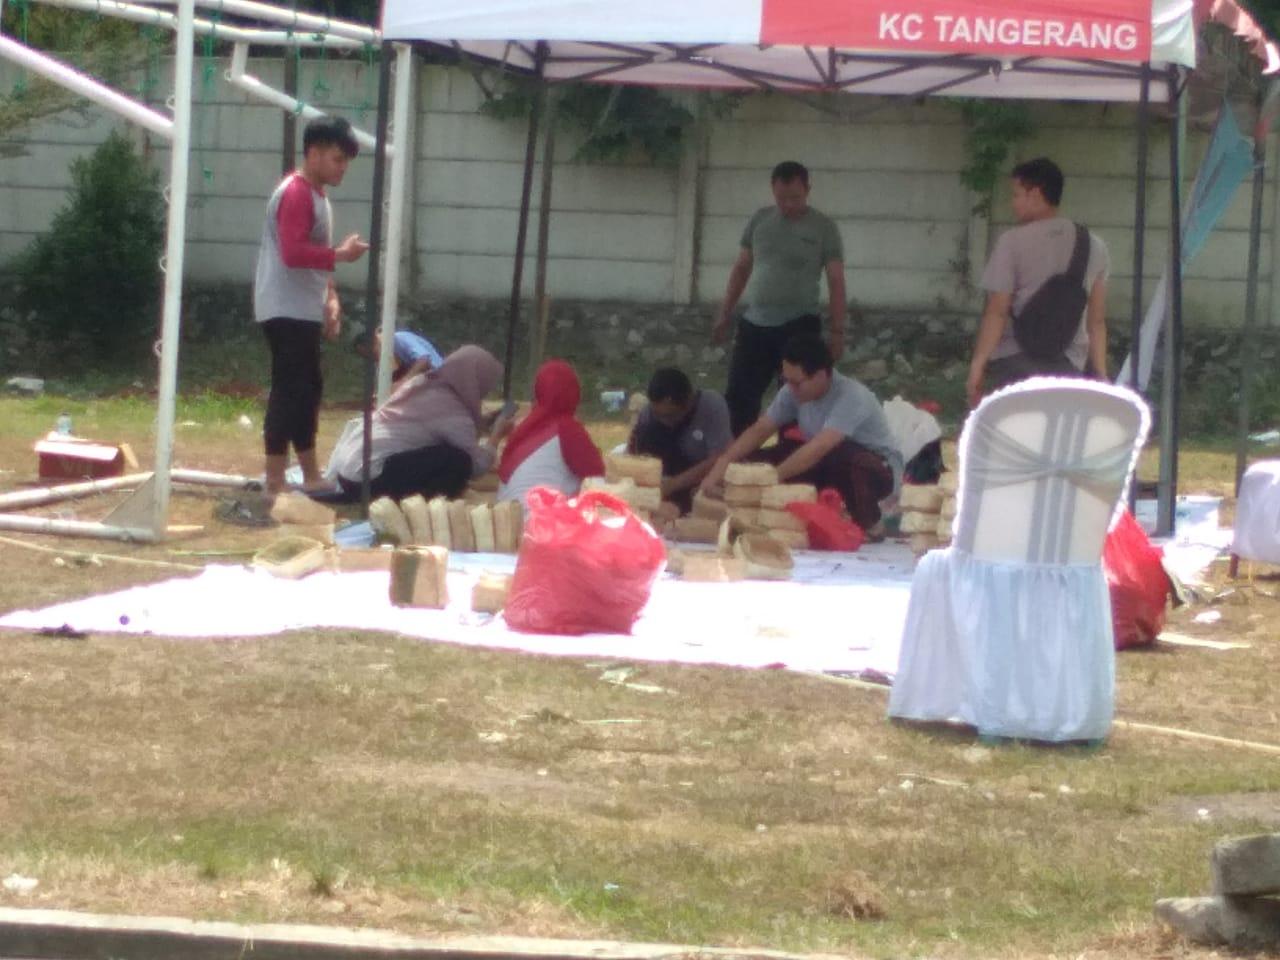 Suasana kegiatan pembagian daging kurban kepada masyarakat dari BNI Syariah Kantor Cabang Tangerang.